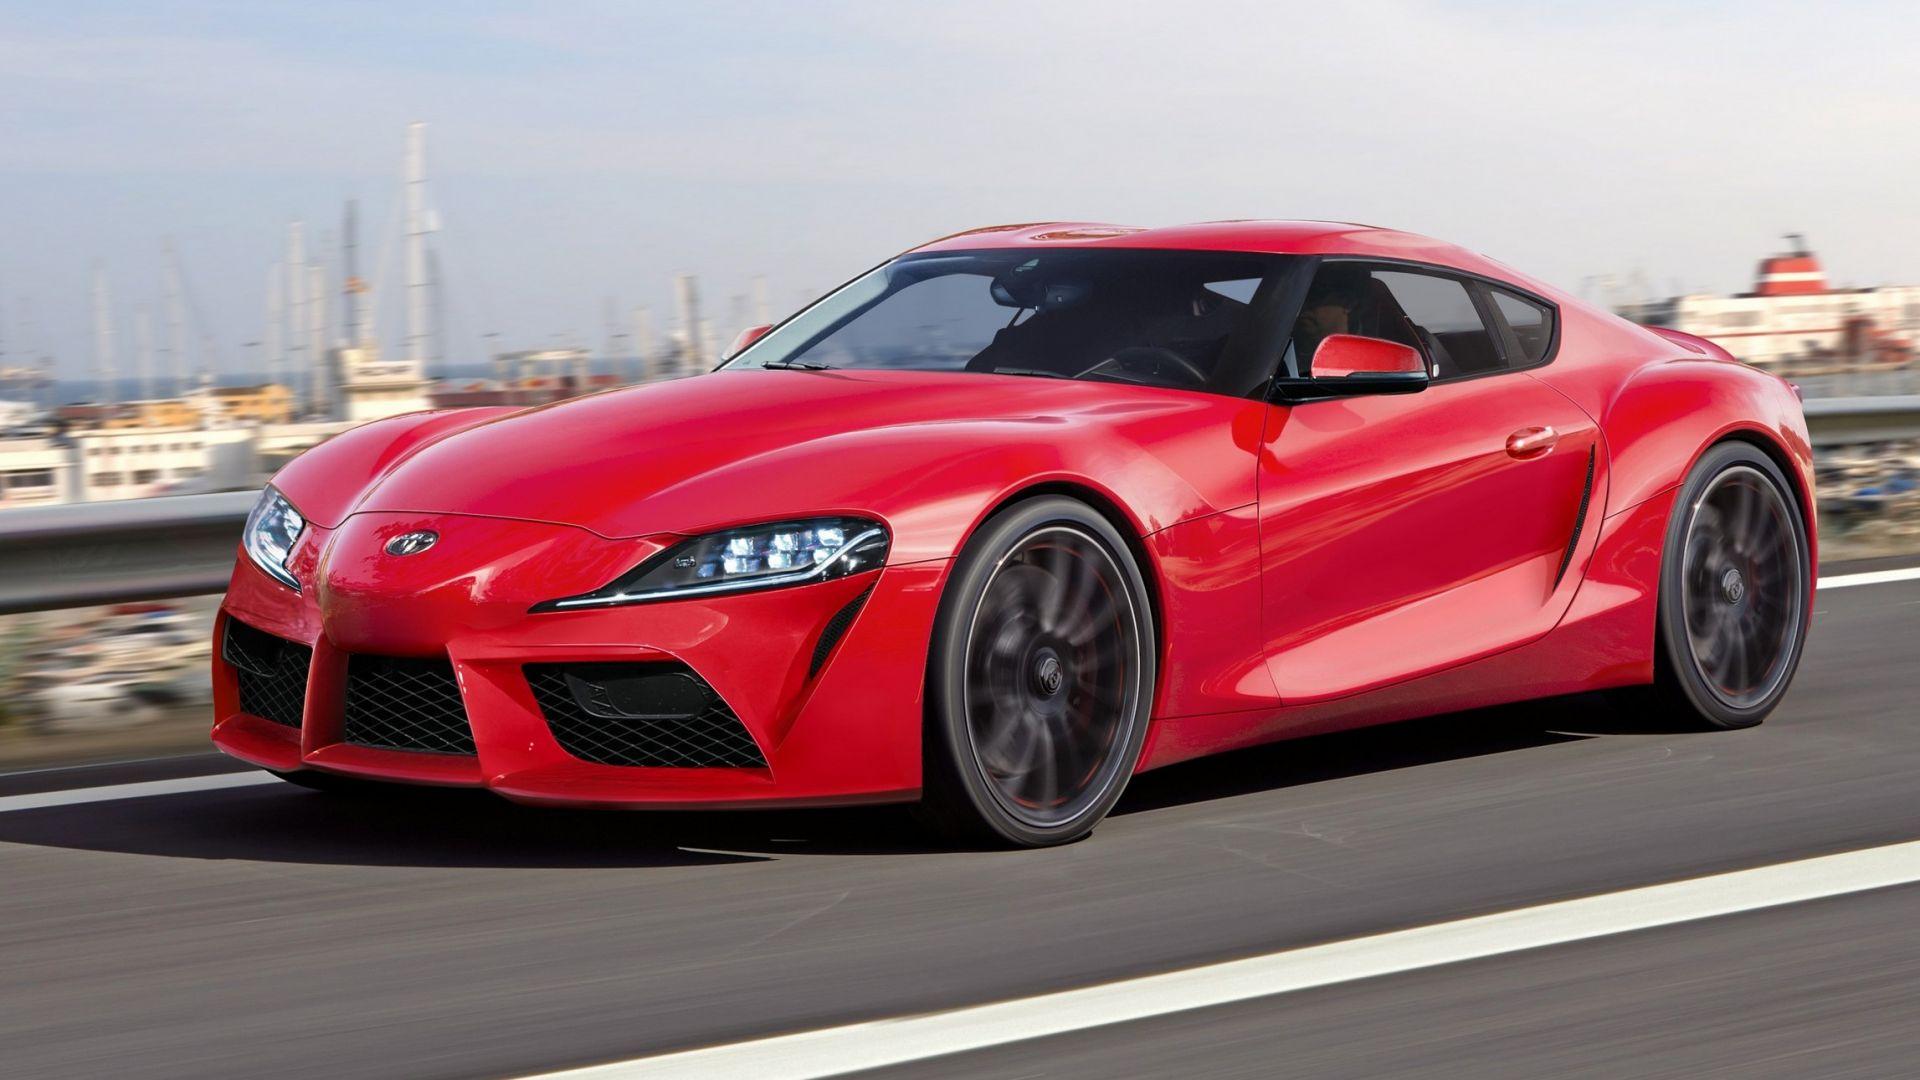 Nuova Toyota Supra 2018: news su prezzo, scheda tecnica ...